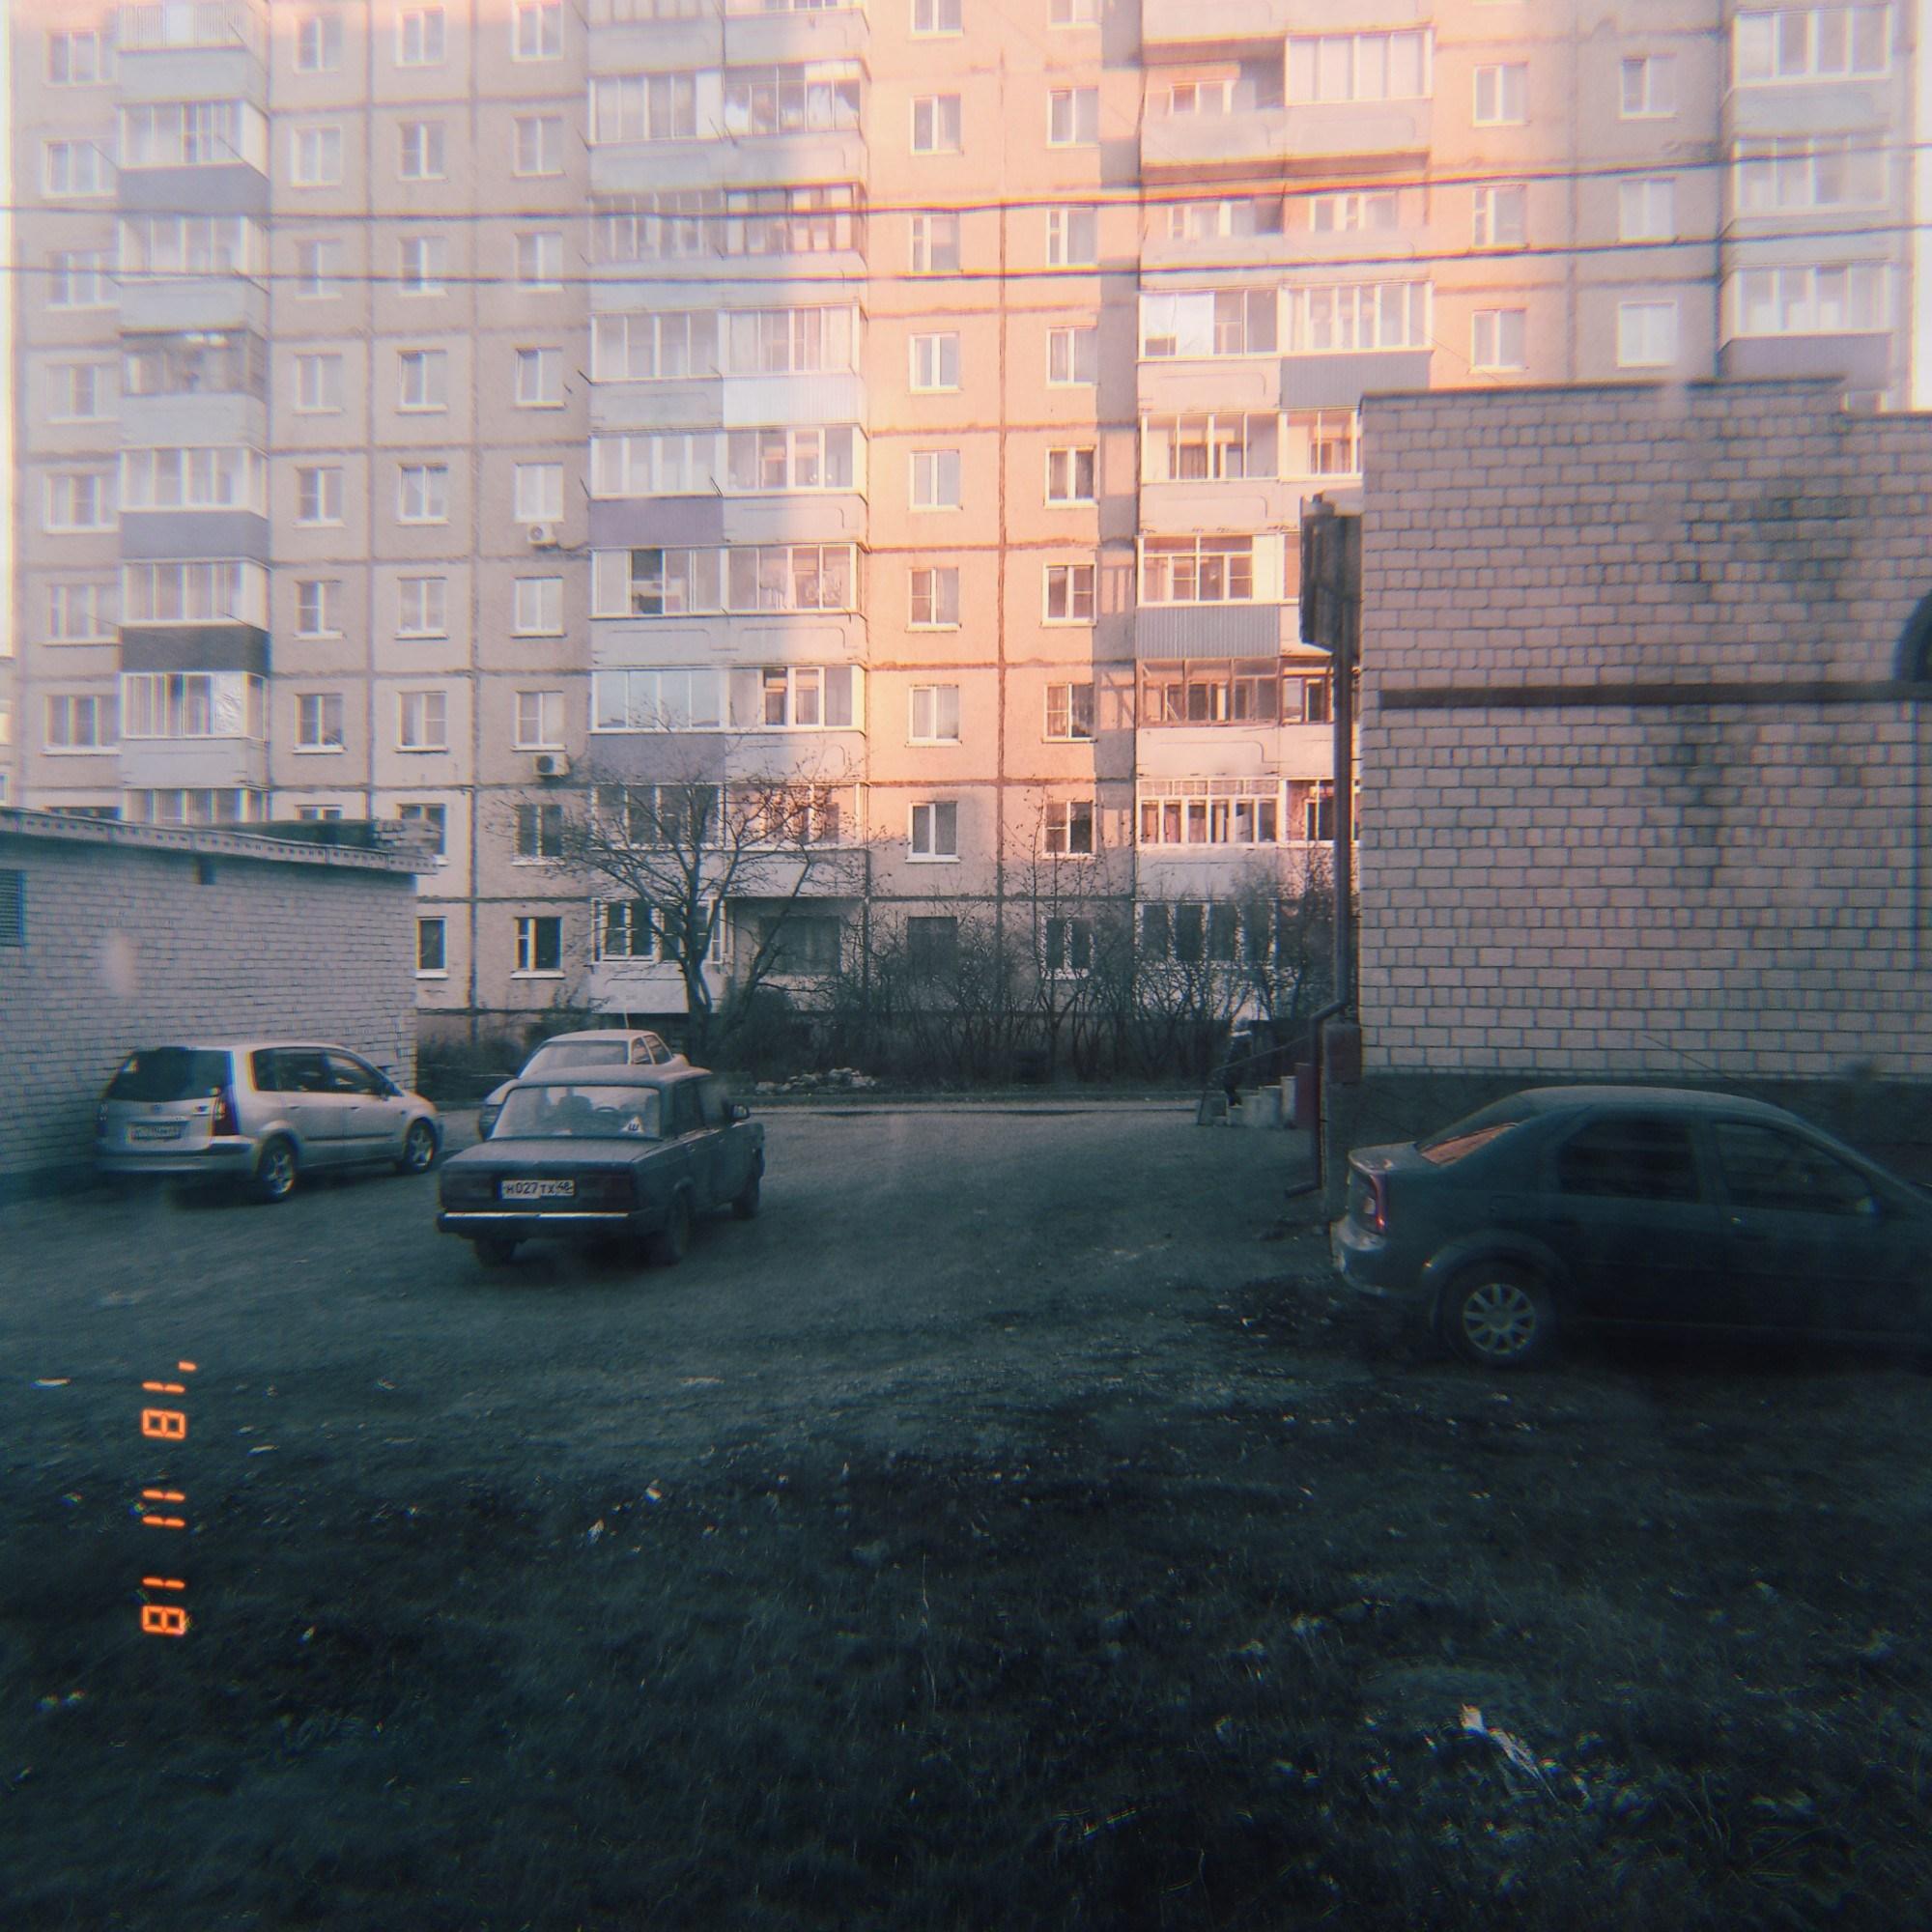 oskina0's Cover Photo